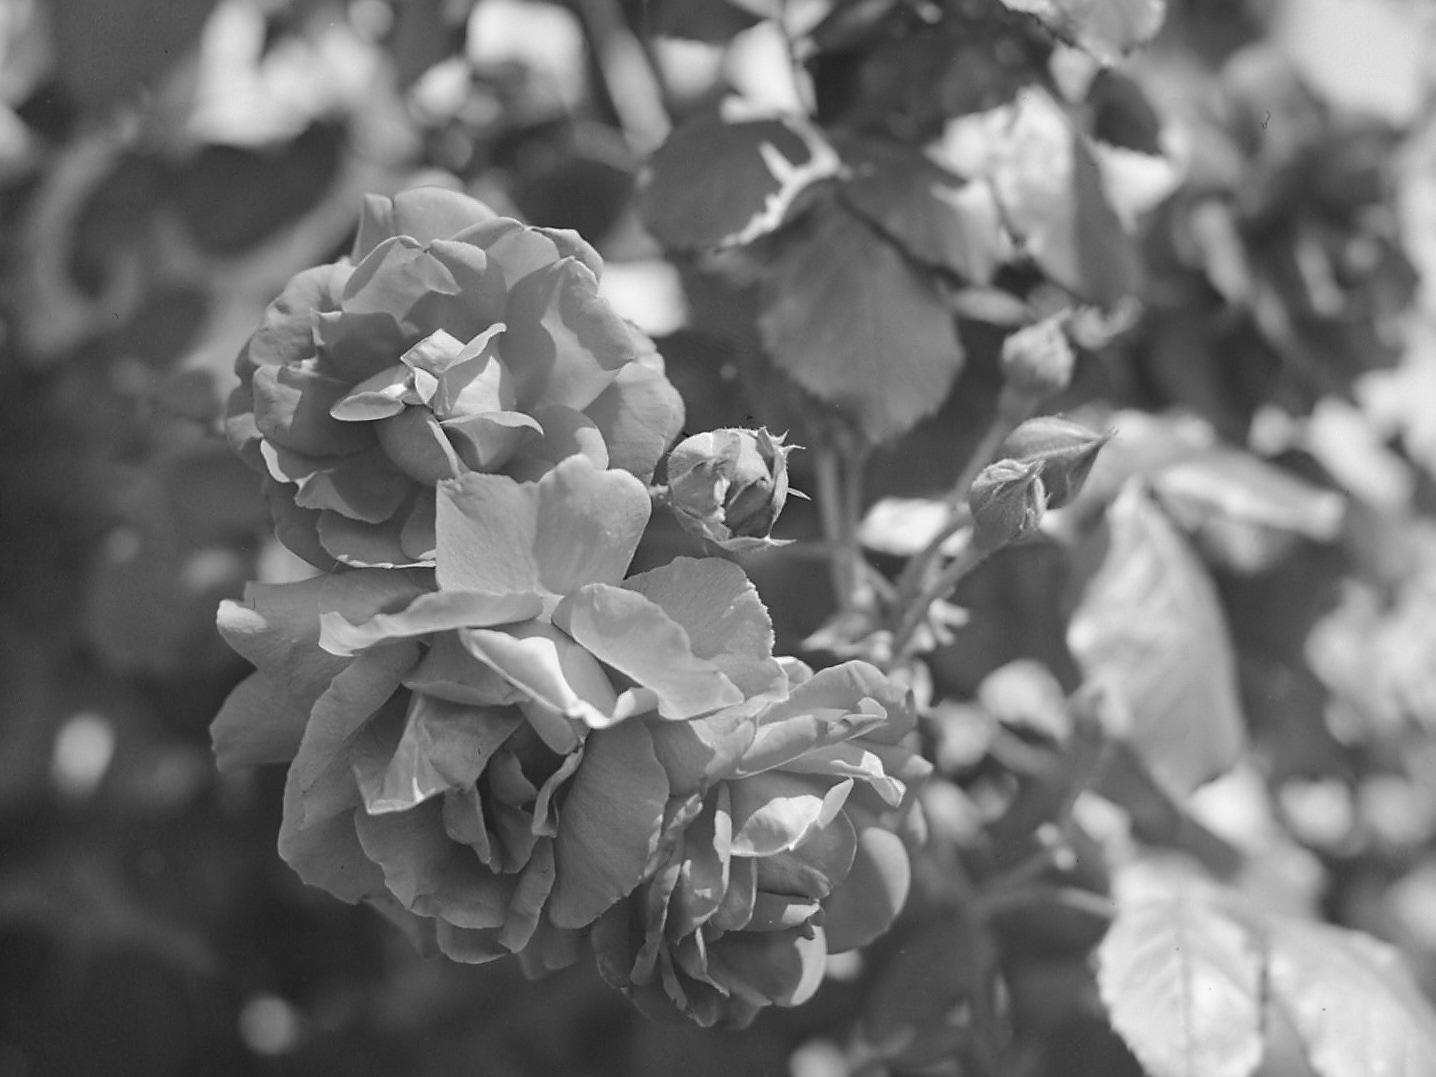 20160415 1724 4x5 roses ©JamesECockroft 4423 1